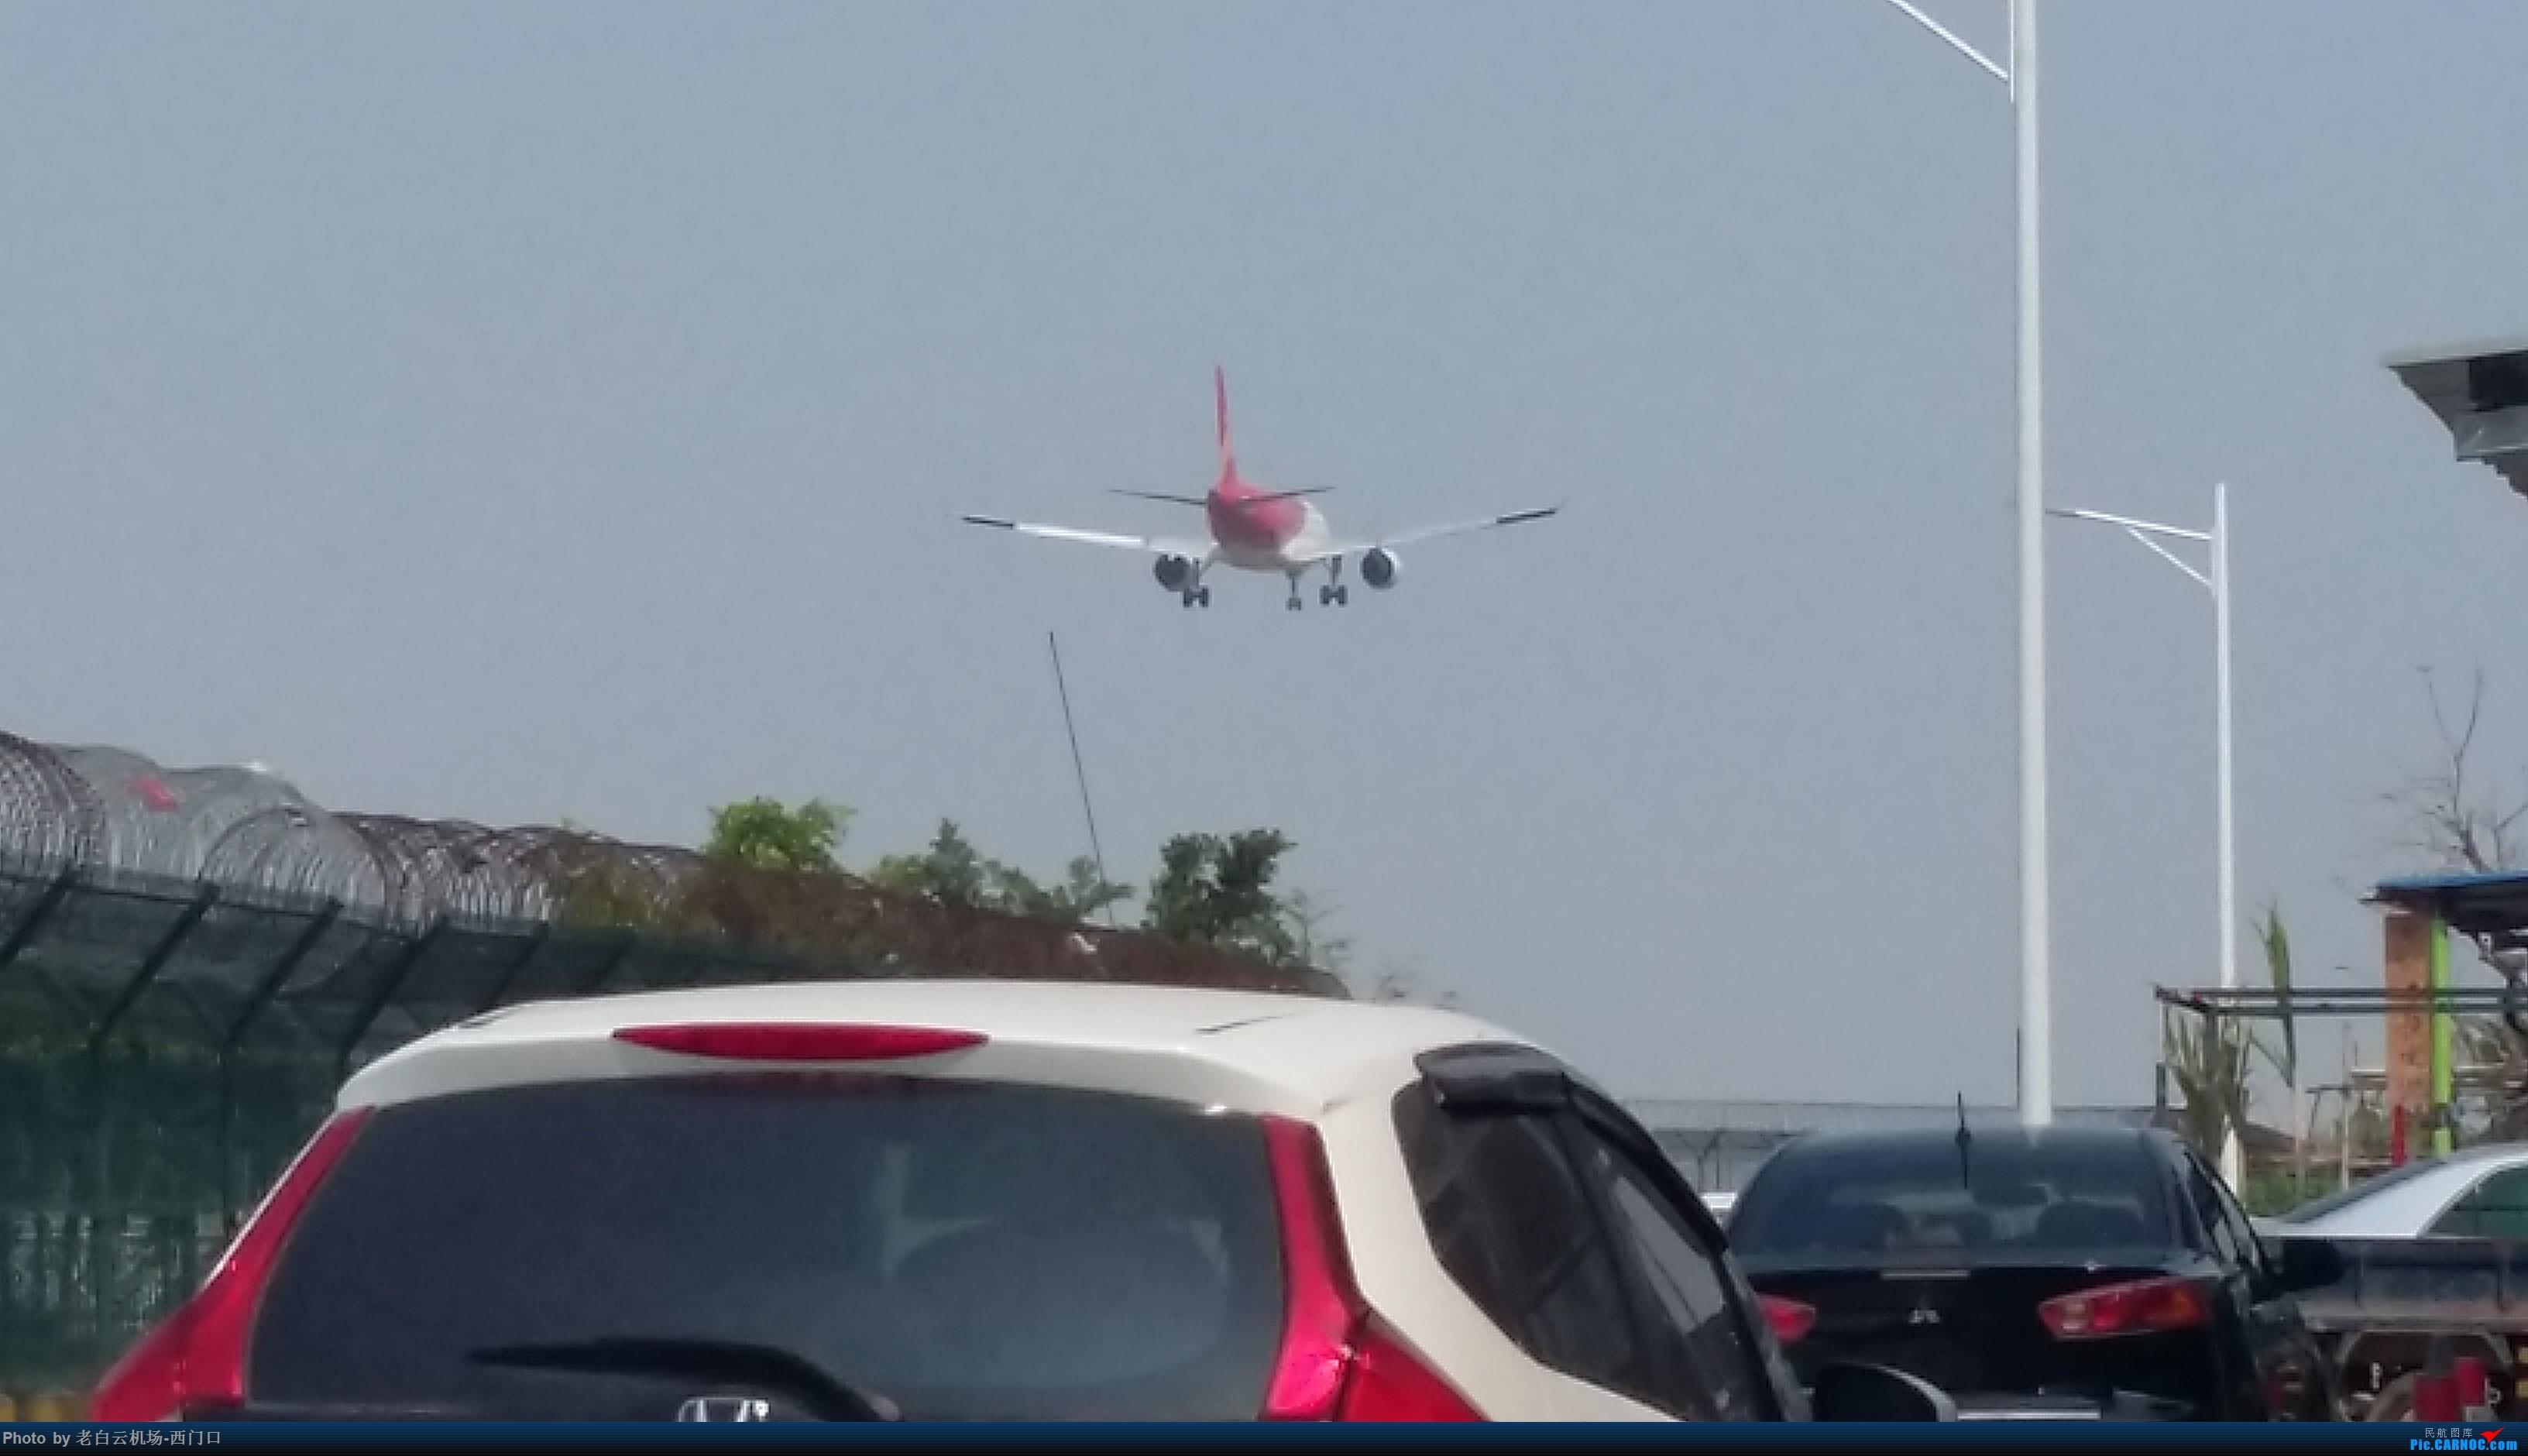 Re:[原创]【梁泽希拍机故事5】2018年第五次拍机 AIRBUS A319-100 B-6196 中国广州白云国际机场